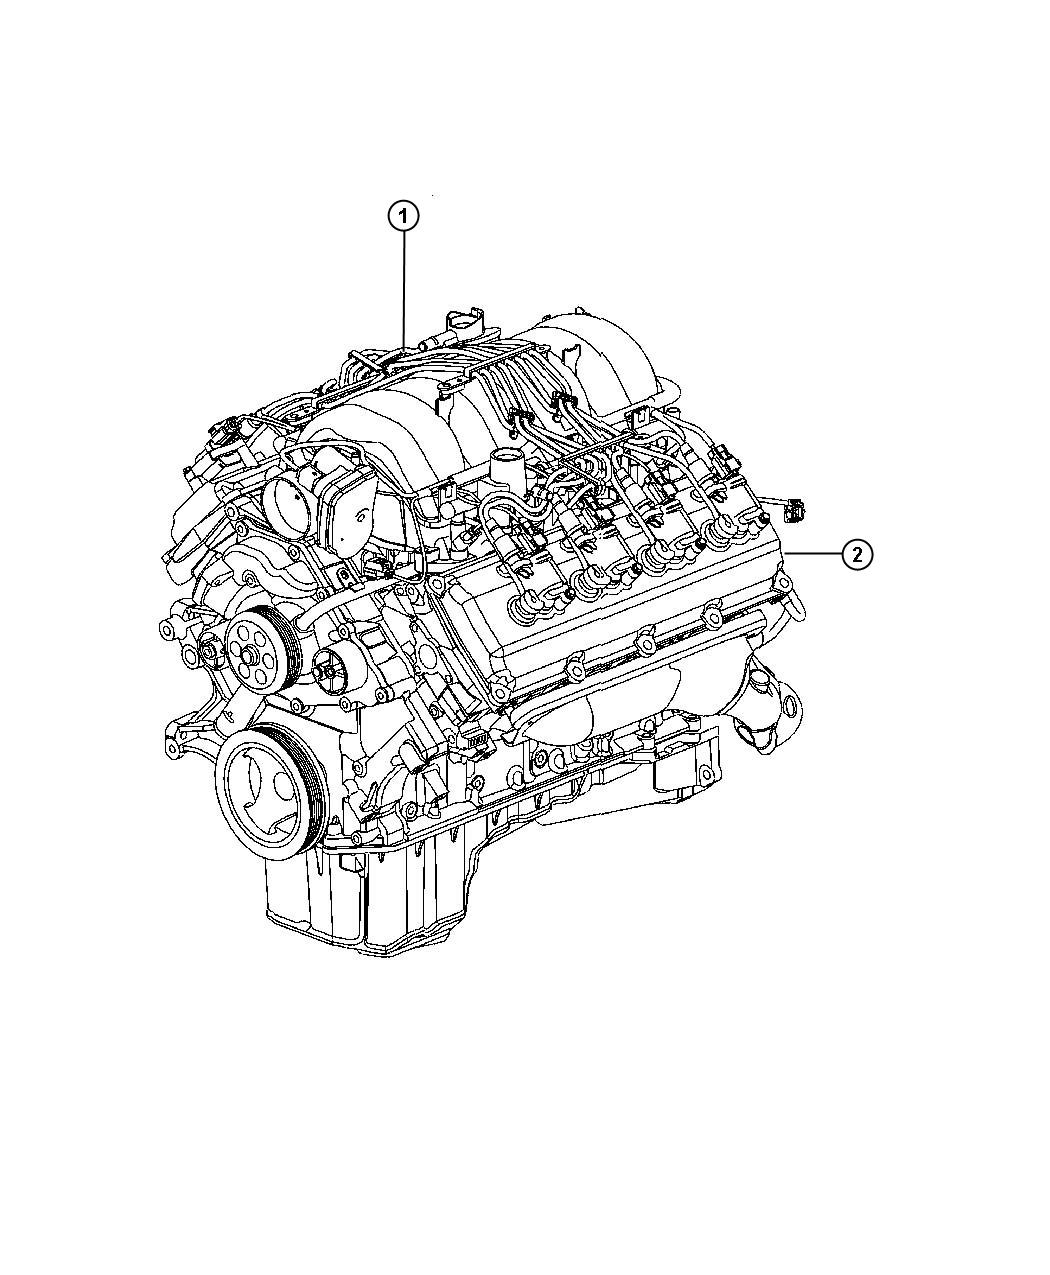 Dodge Ram Engine Long Block Remanufactured Manifold Failure Valve